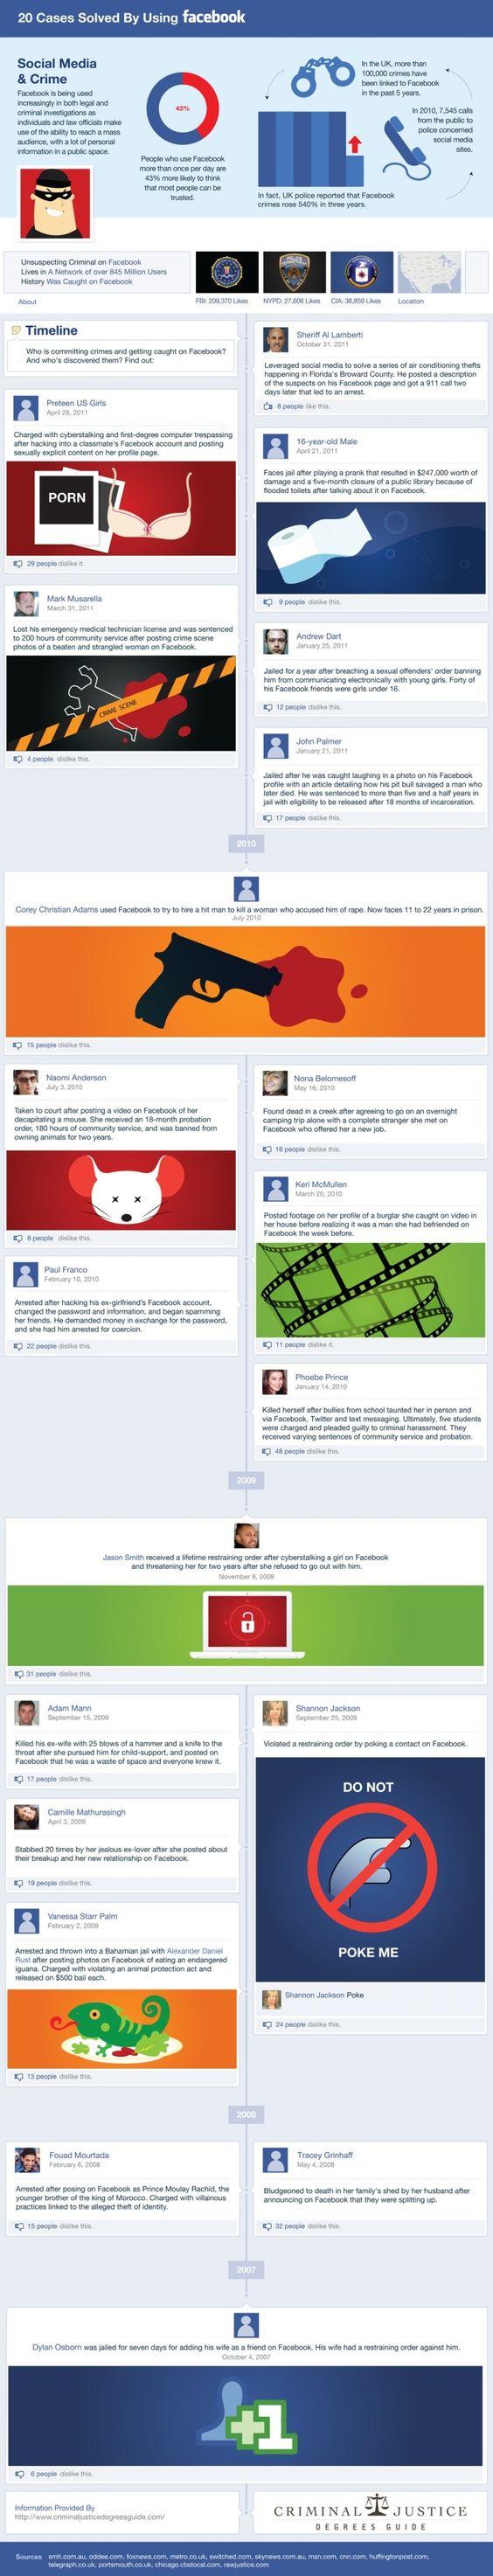 Infografías/Social Media. Casos resueltos en EE.UU con la ayuda de Facebook.: 20 Criminal, Social Network, Info Graphic, Facebook Crime, Website, 20 Crime, Facebook Infographic, Infamous Crime